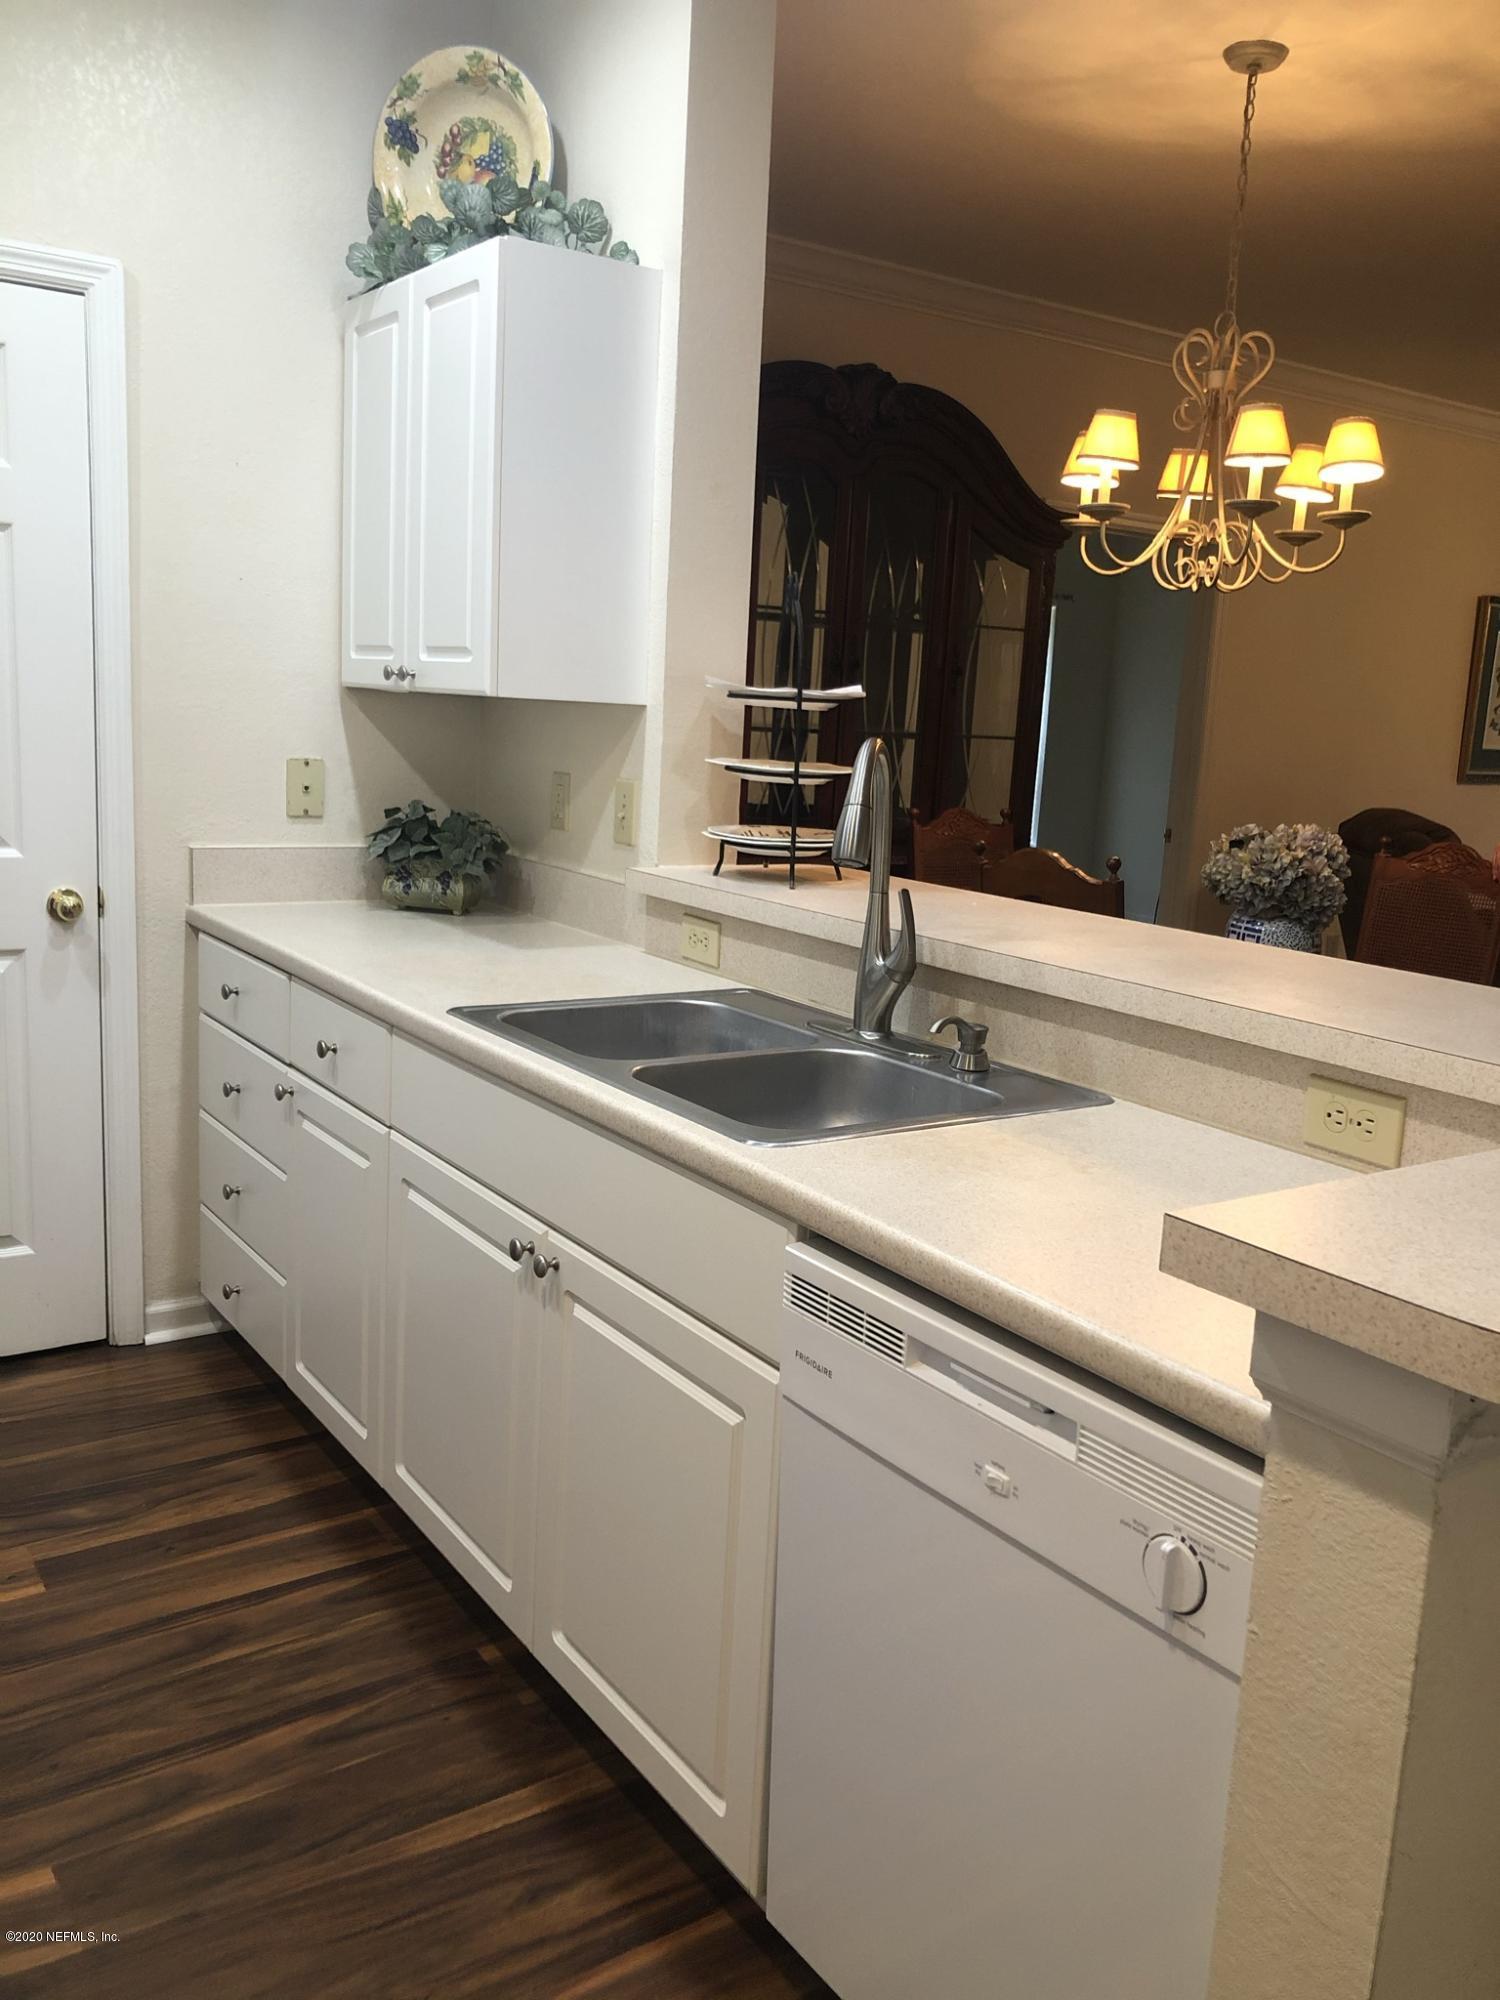 10901 BURNT MILL, JACKSONVILLE, FLORIDA 32256, 2 Bedrooms Bedrooms, ,2 BathroomsBathrooms,Residential,For sale,BURNT MILL,1078243